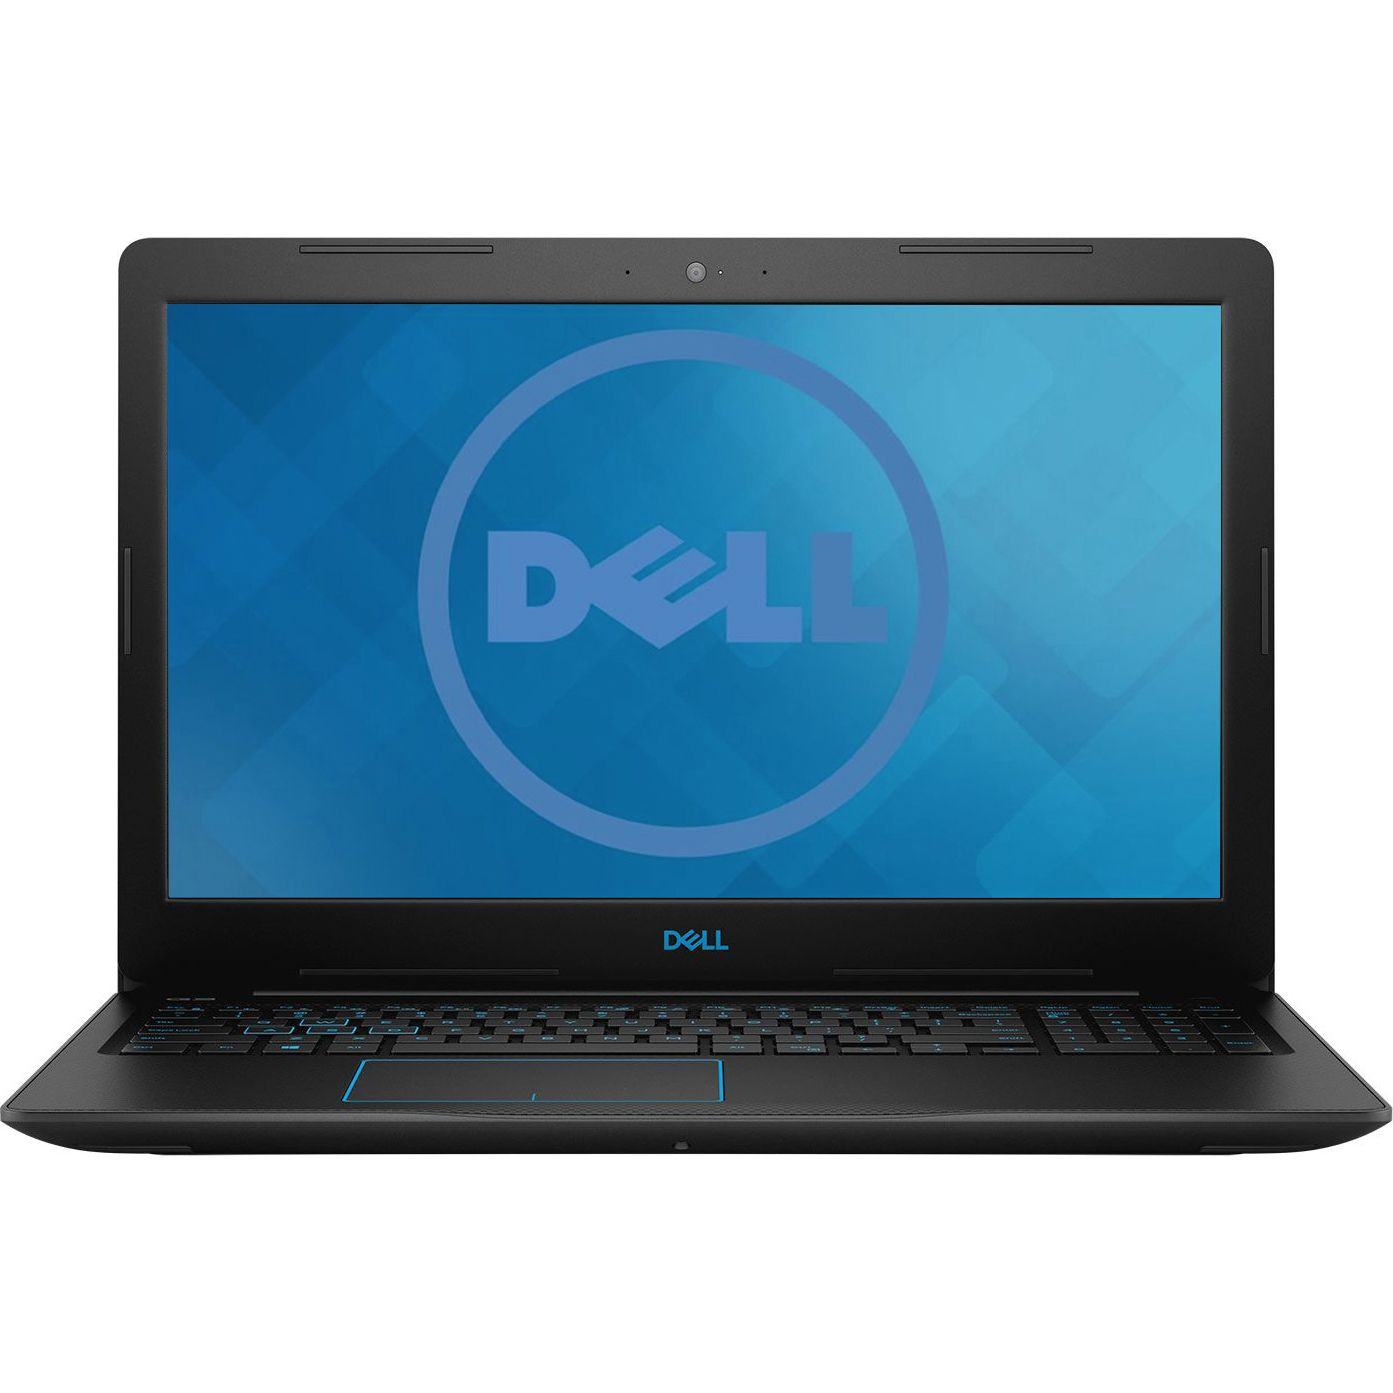 Notebook Dell G3 3579 15.6 Full HD Intel Core i5-8300H GTX 1050-4GB RAM 8GB HDD 1TB + SSD 16GB Windows 10 Home